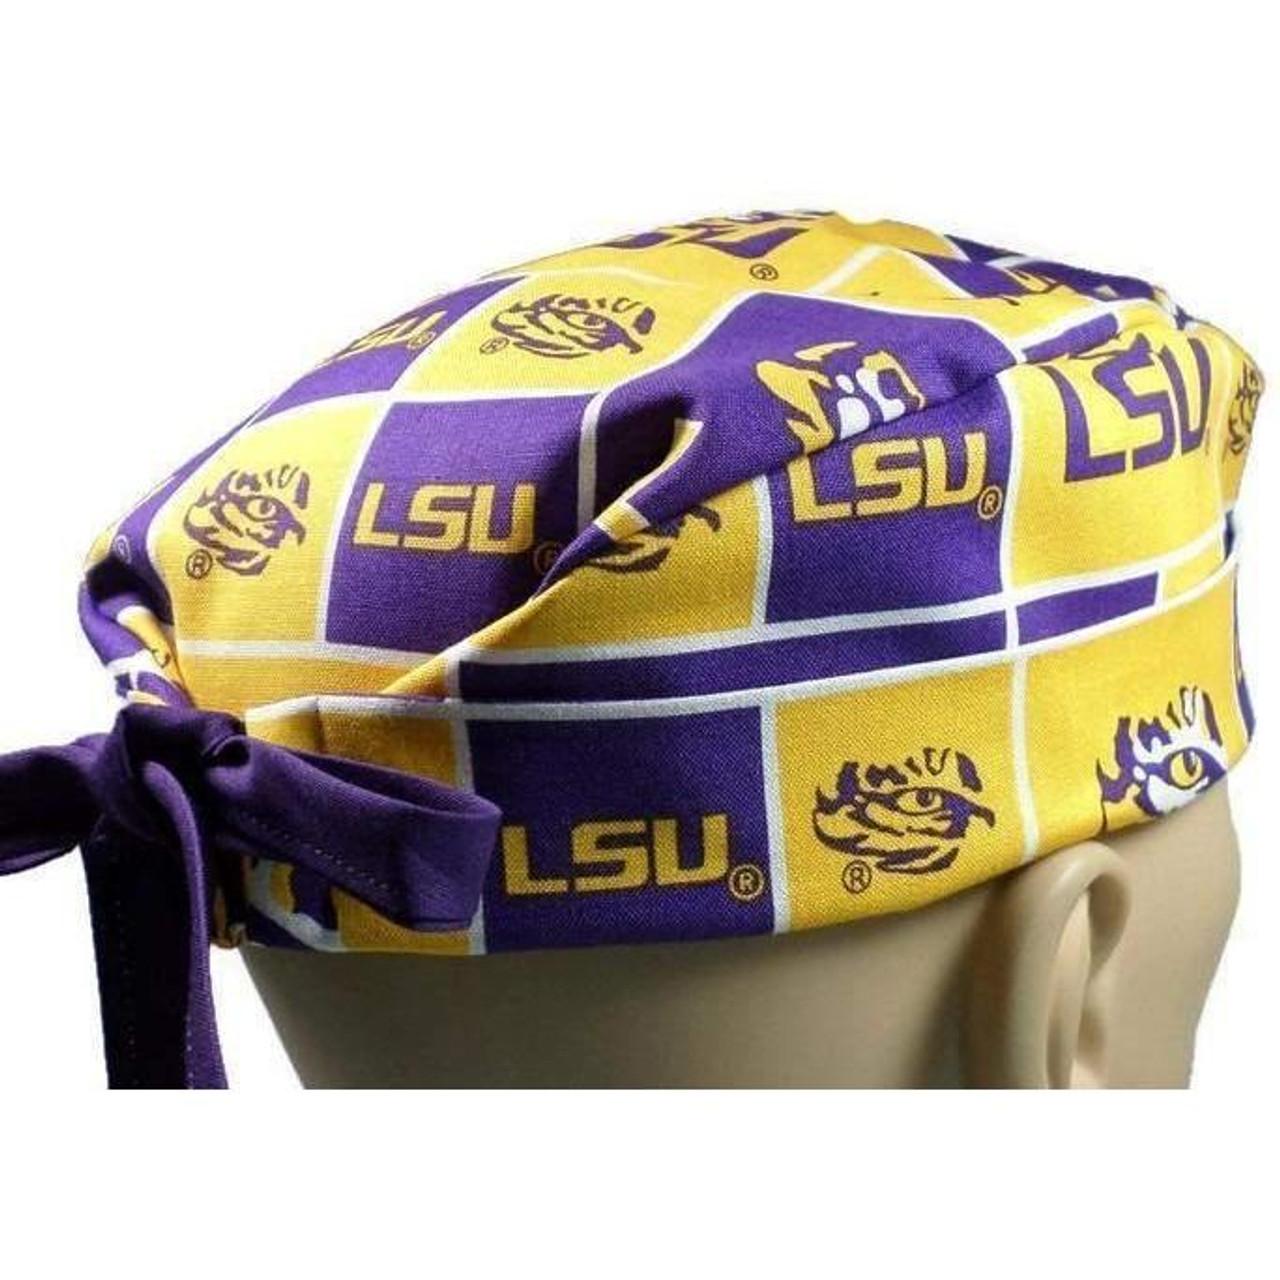 8d6e9f119b71f ... usa mens adjustable fold up cuffed or uncuffed surgical scrub hat cap  made with louisiana lsu